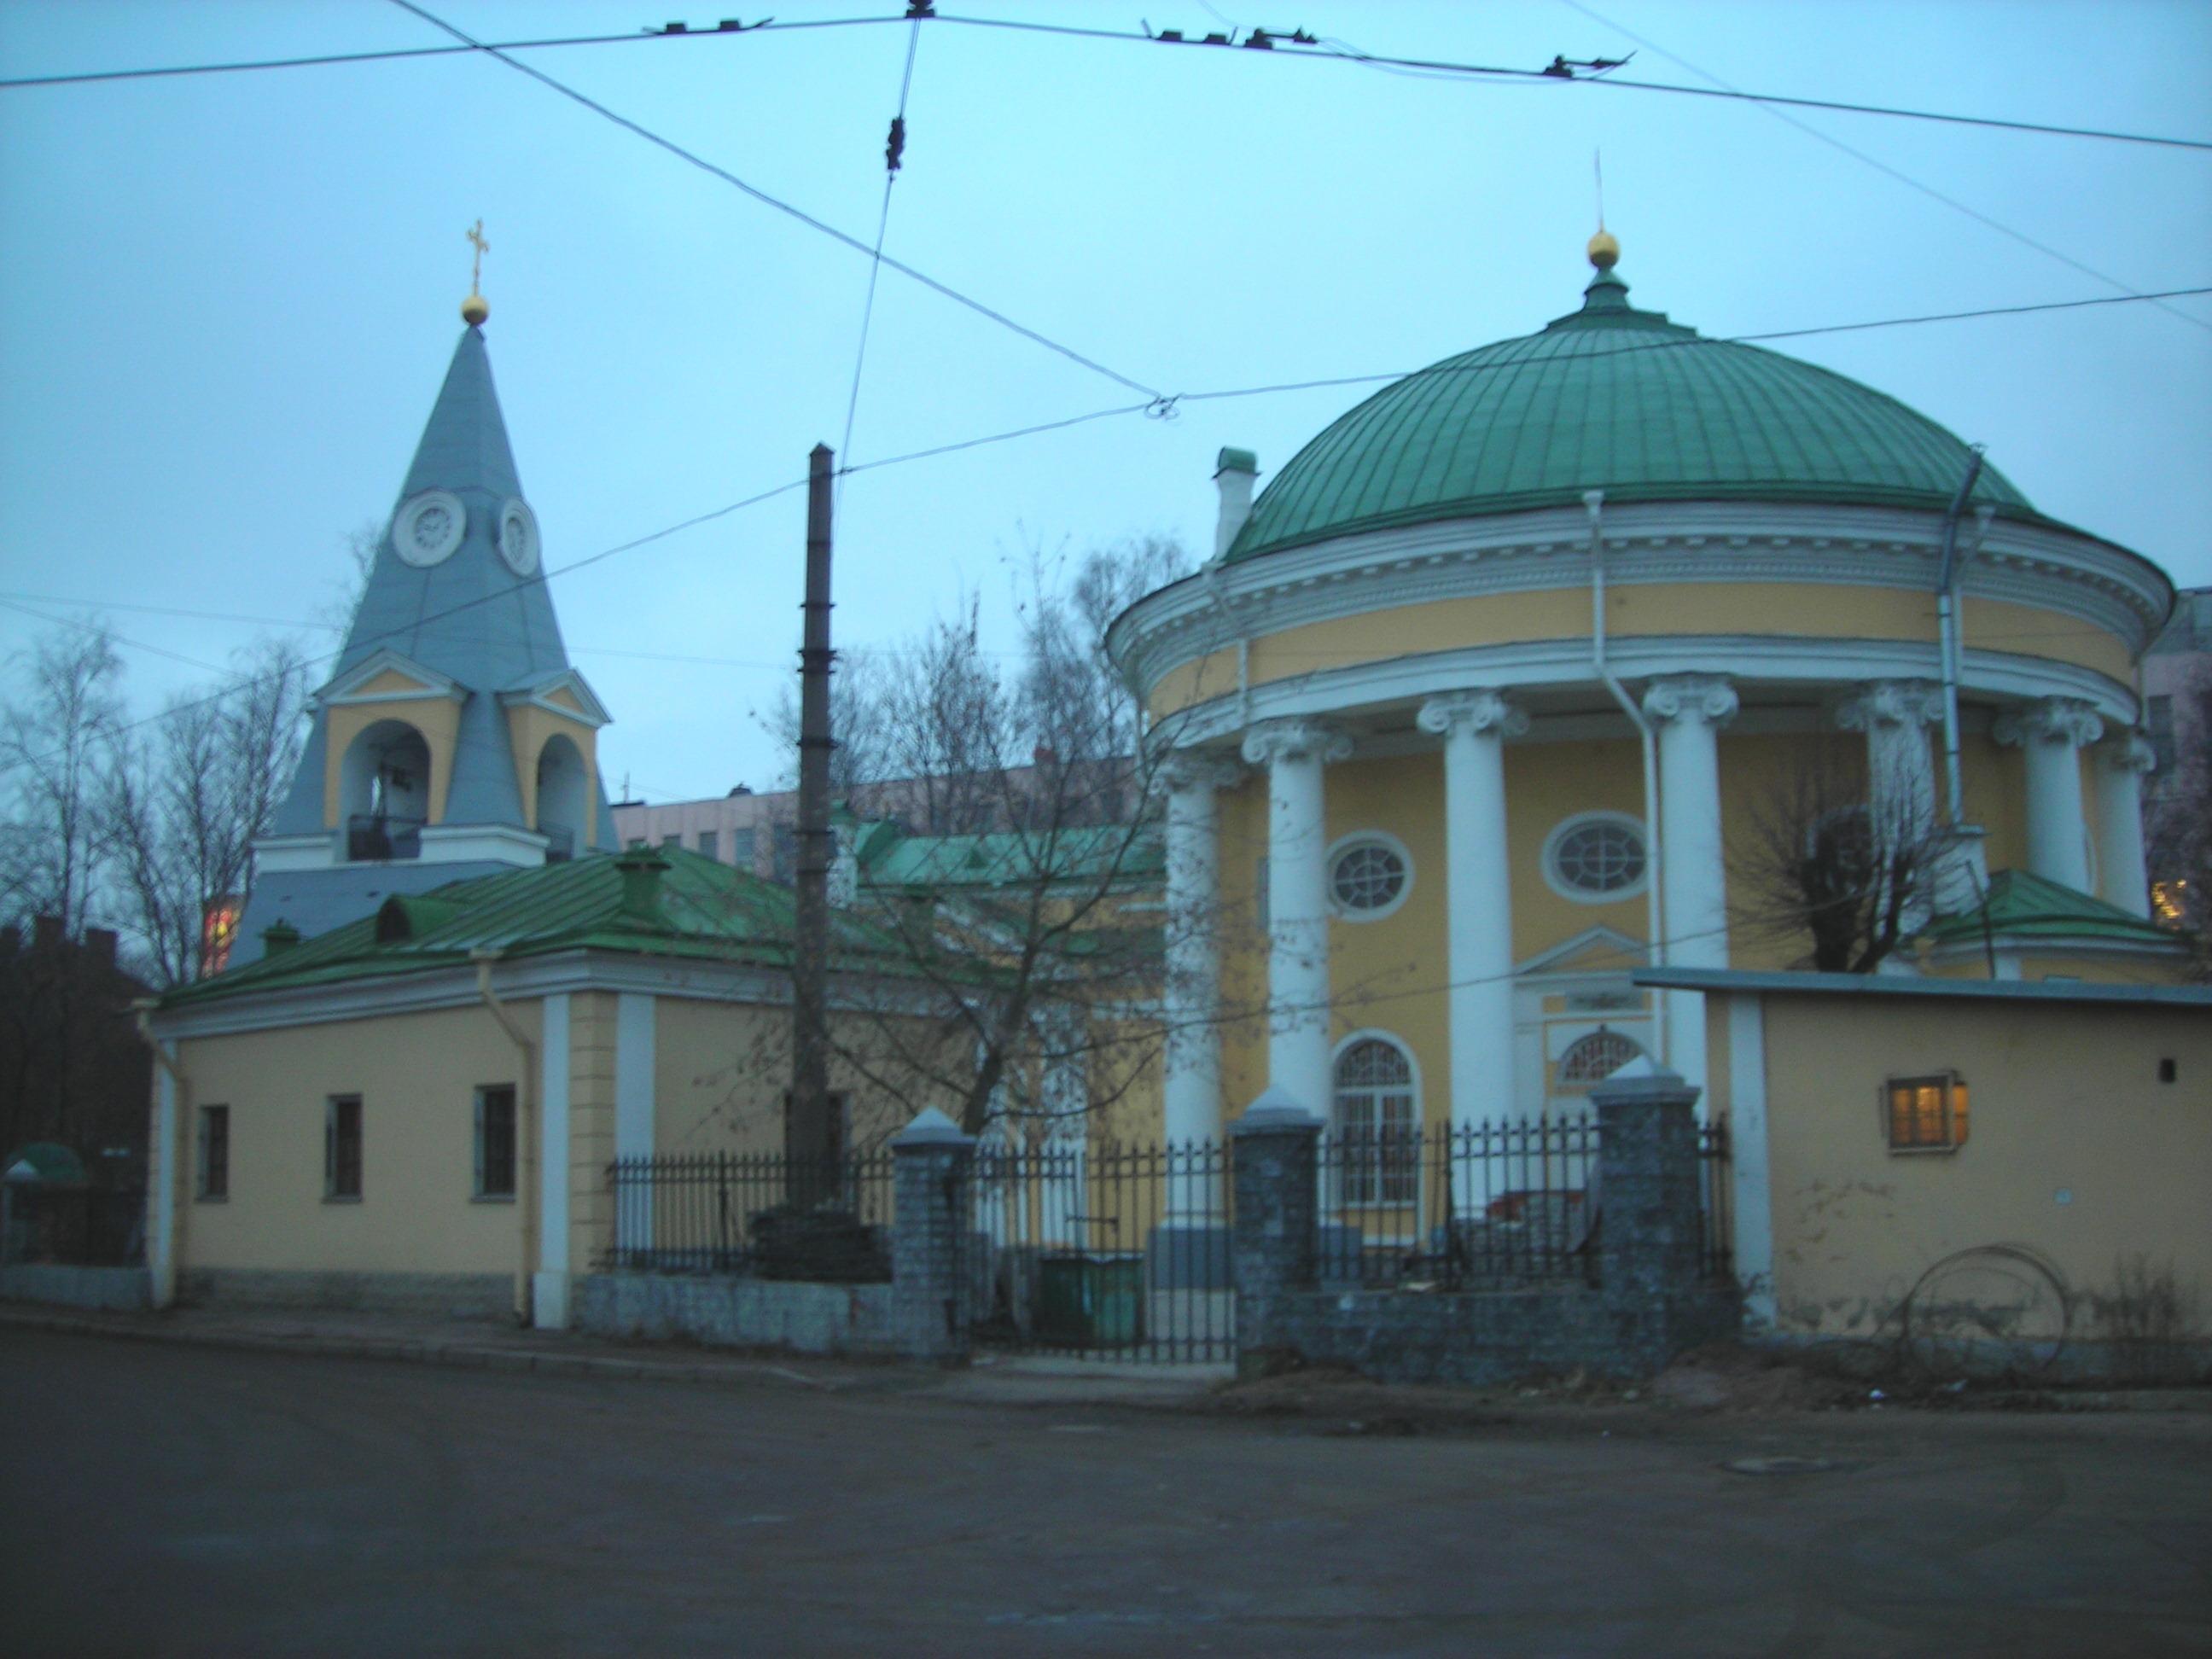 Troitskaya church in Saint Petersburg, known as